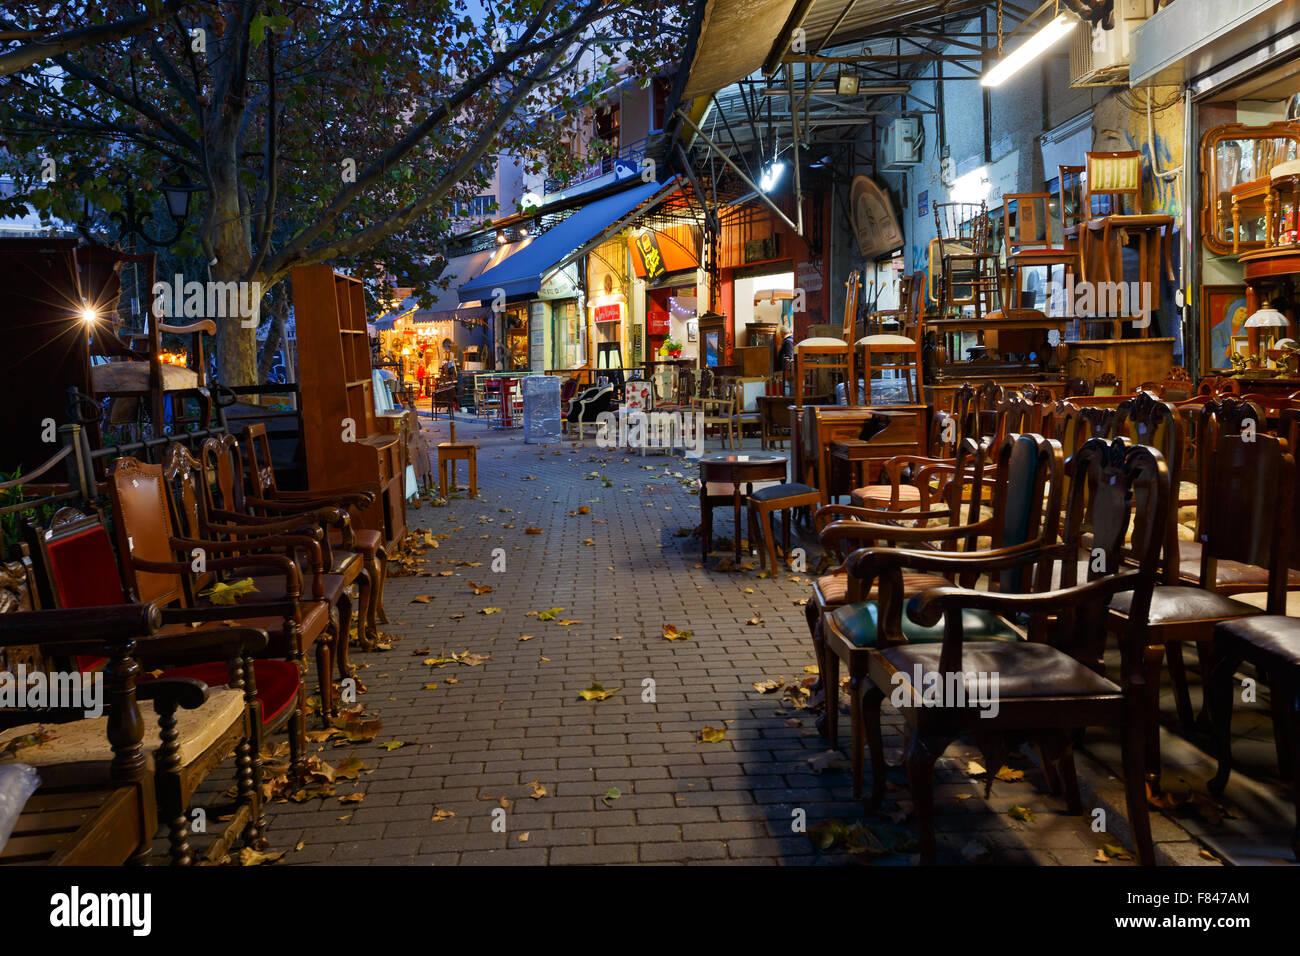 Antique furniture shop in the flea market in the Monastiraki area in Plaka,  Athens - Antique Furniture Shop In The Flea Market In The Monastiraki Area In